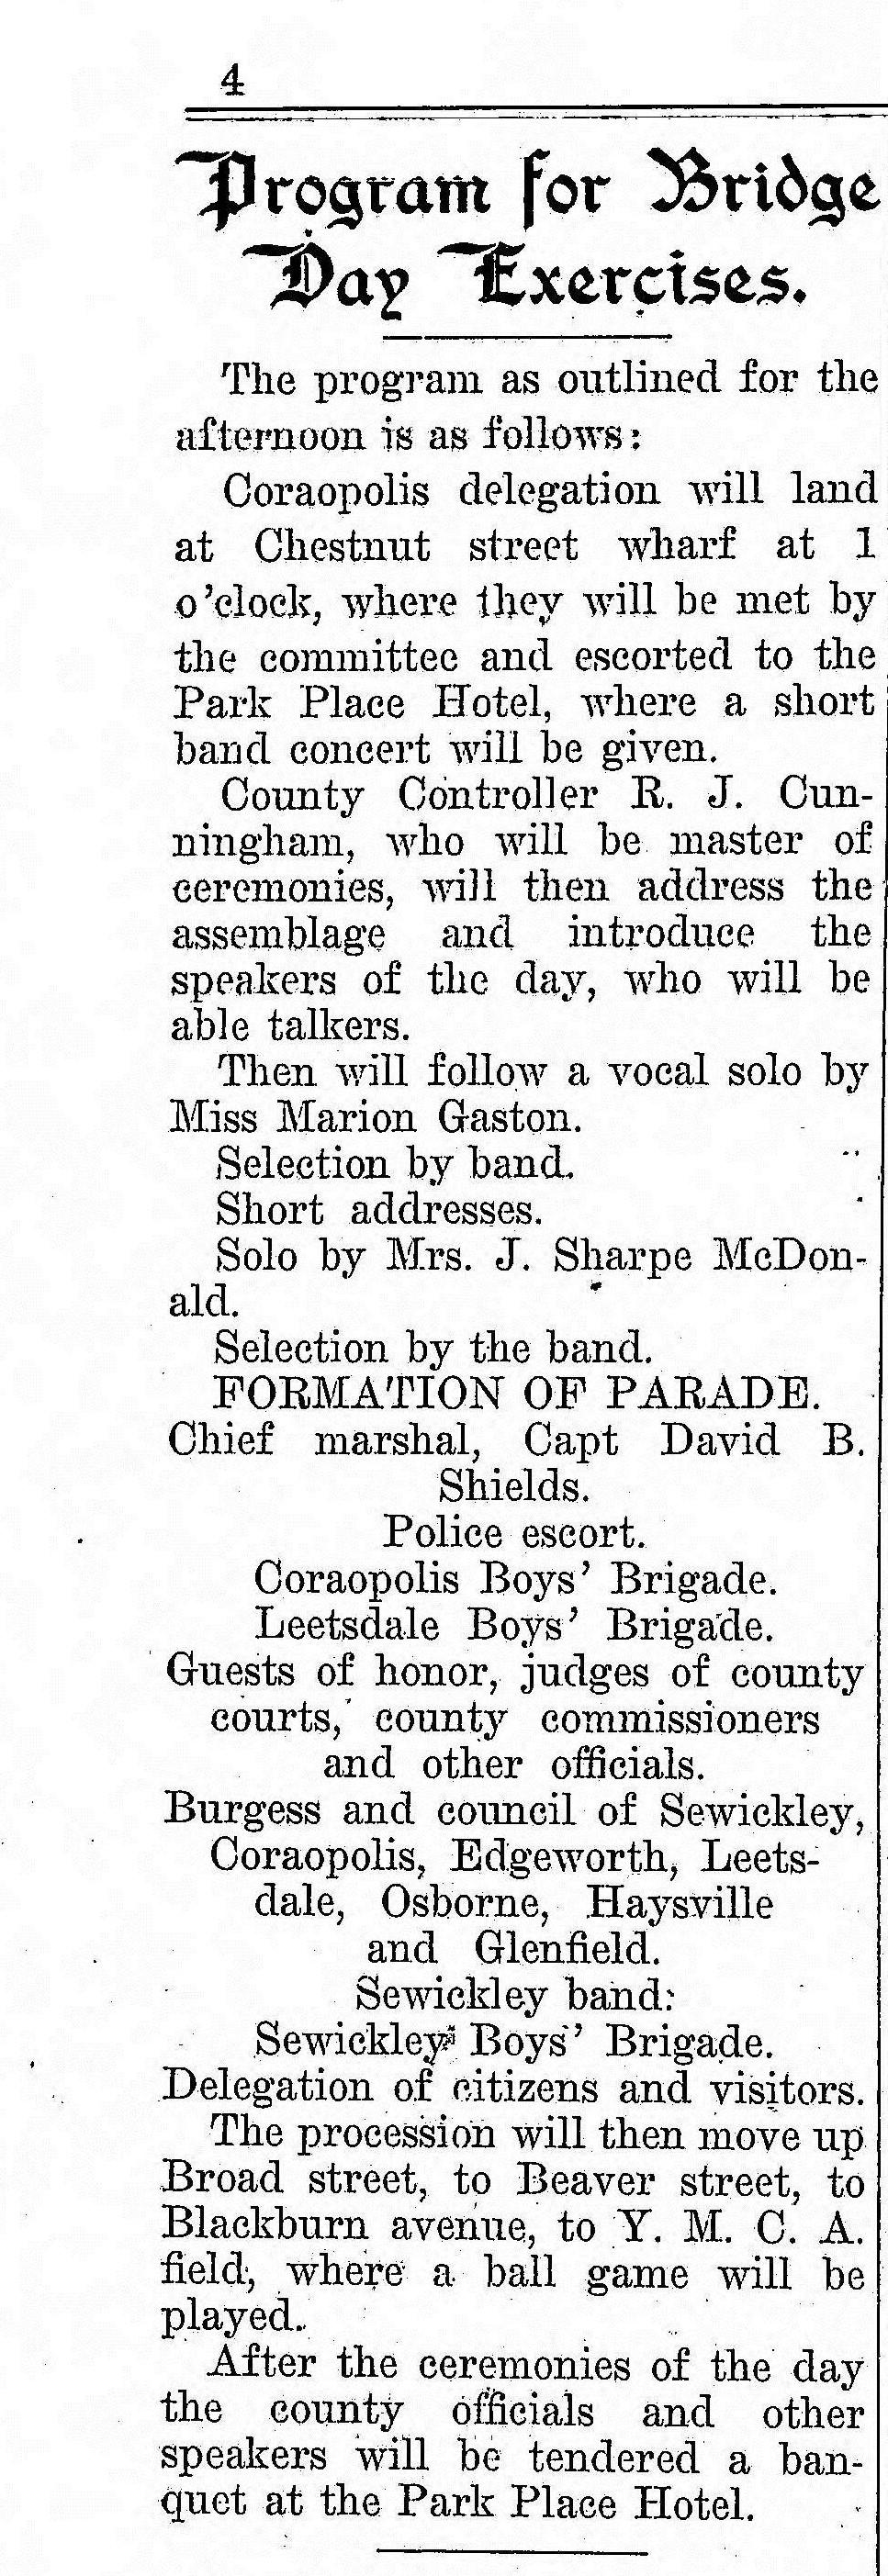 1909-07-17 The Weekly Herald (Sewickley Herald) - Program for Bridge-Day (pg4).jpg